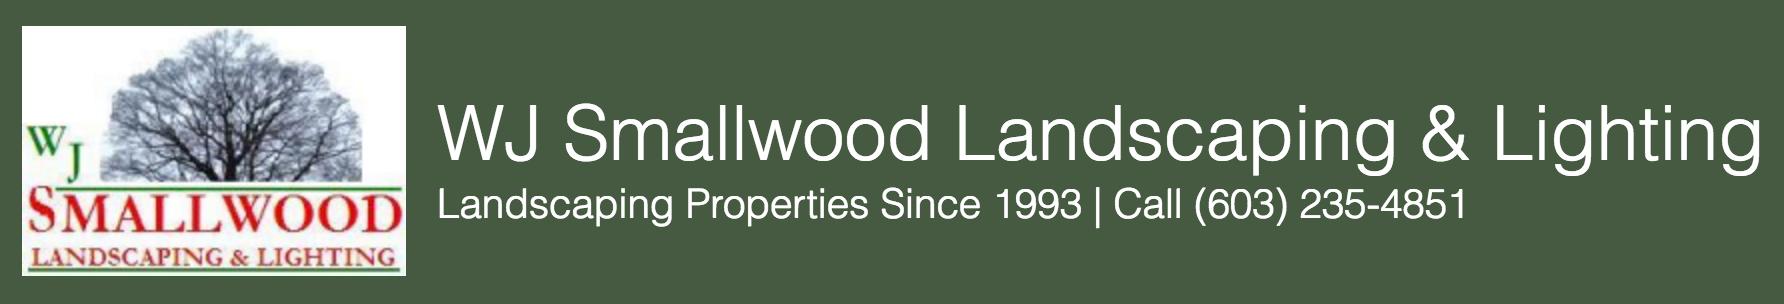 WJ Smallwood Payment Portal